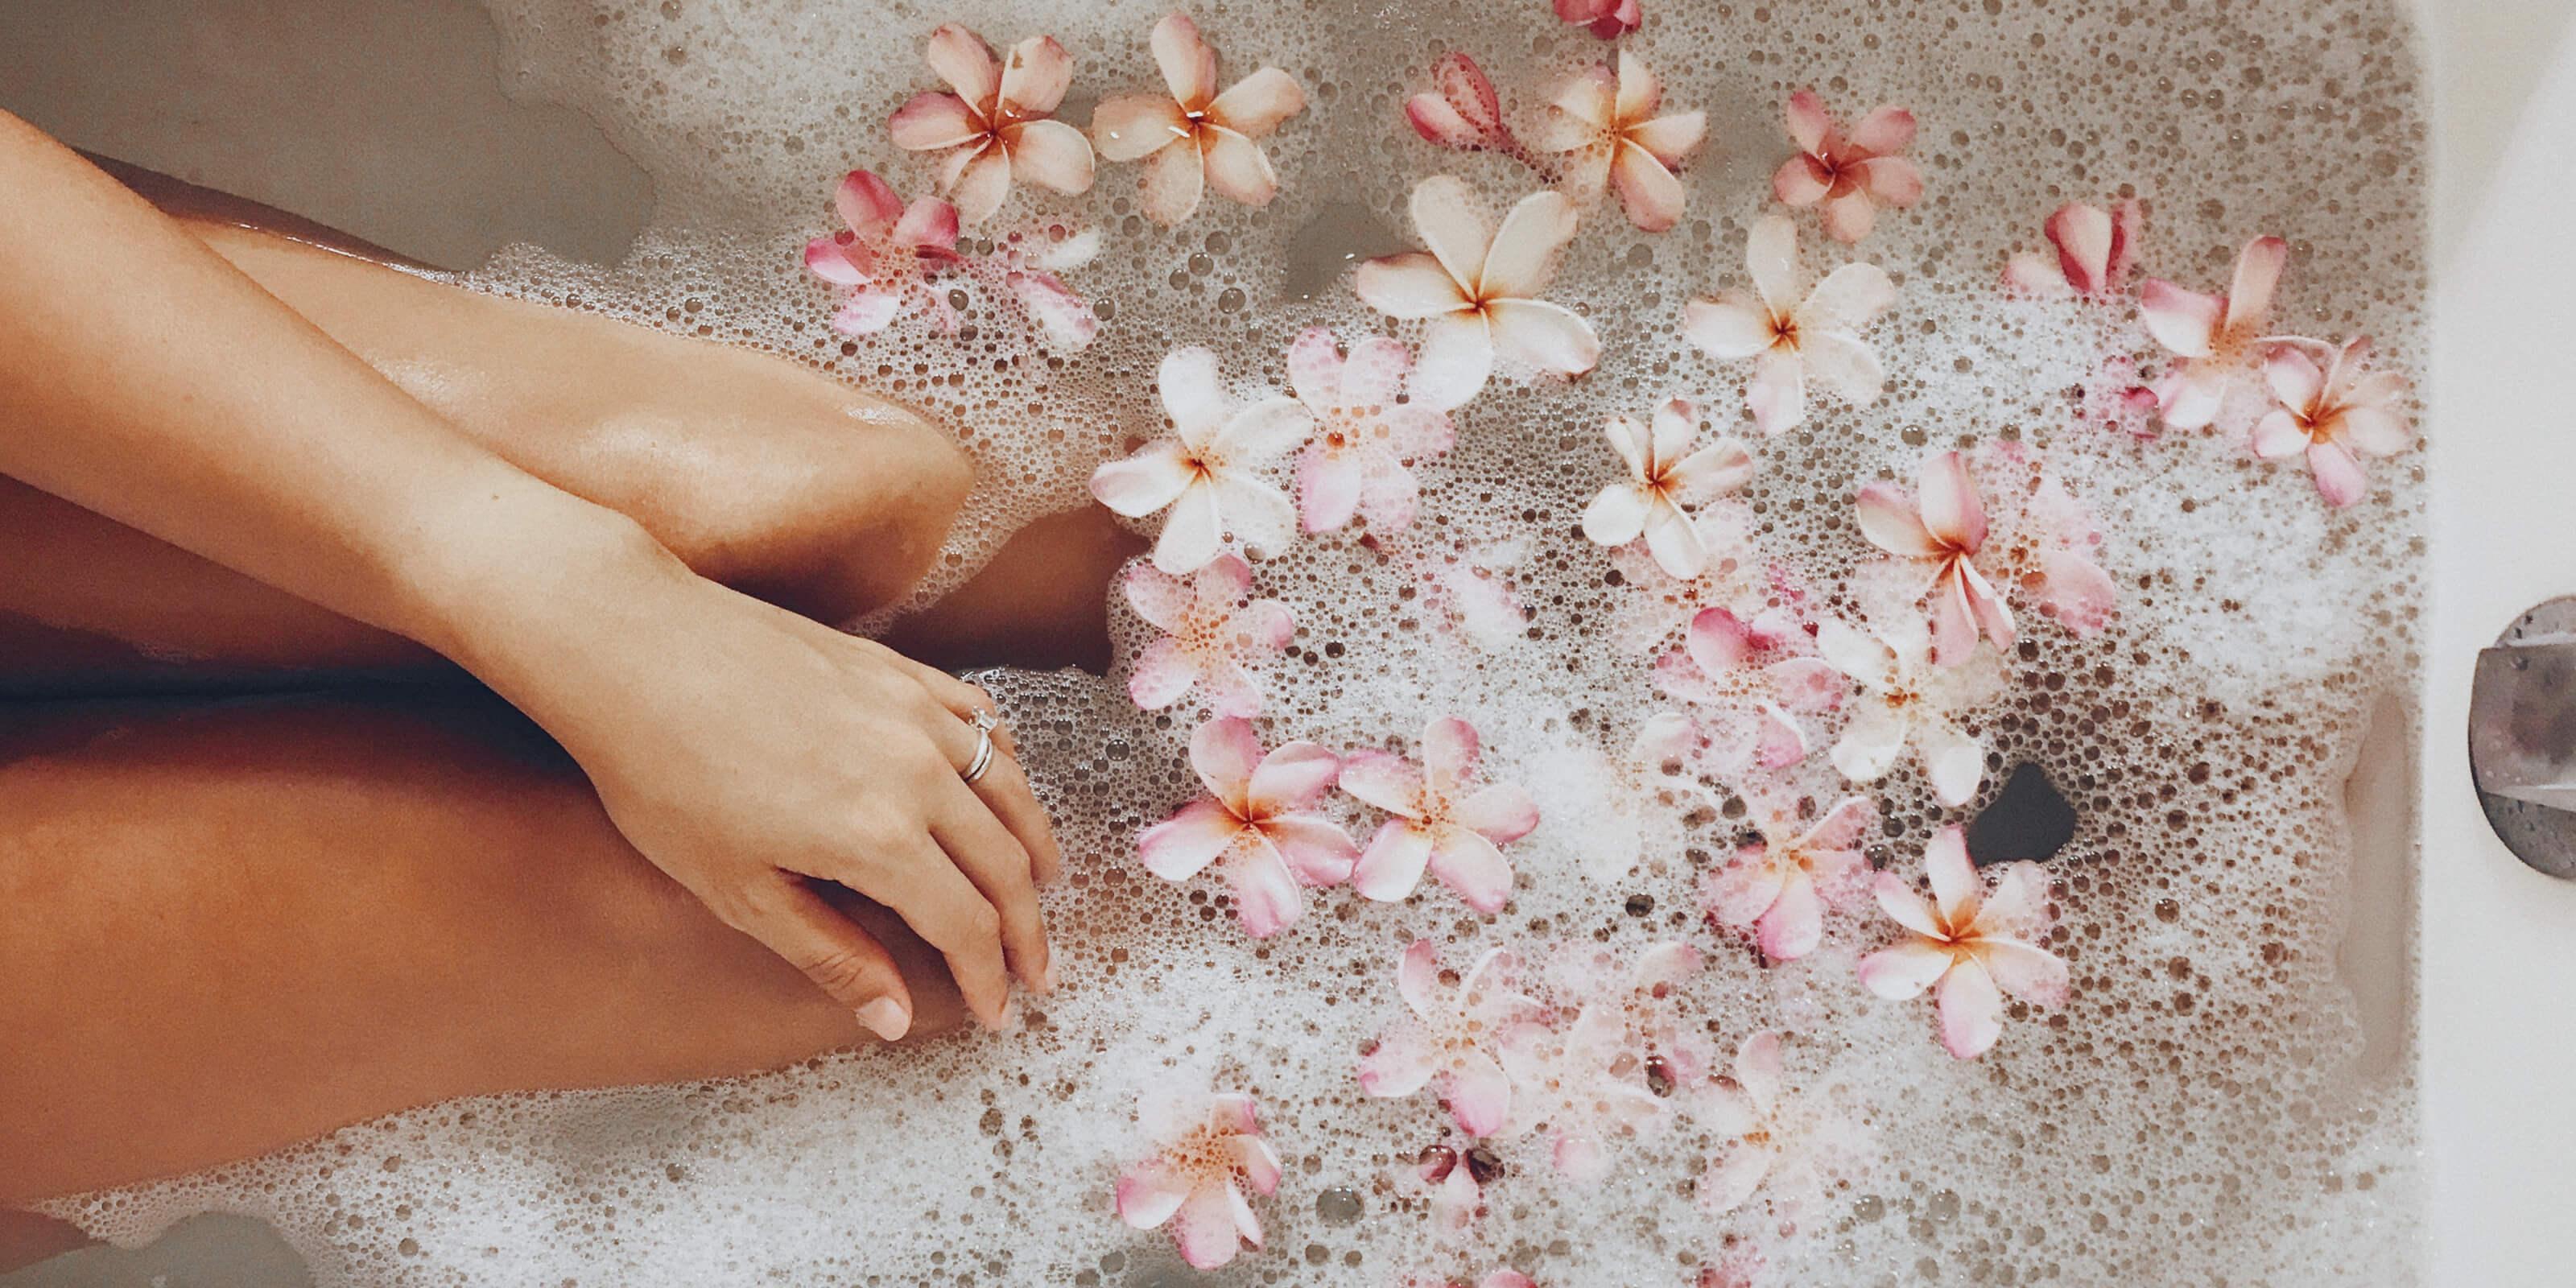 bath tub, flower petals, soap bubbles, woman's hand and legs